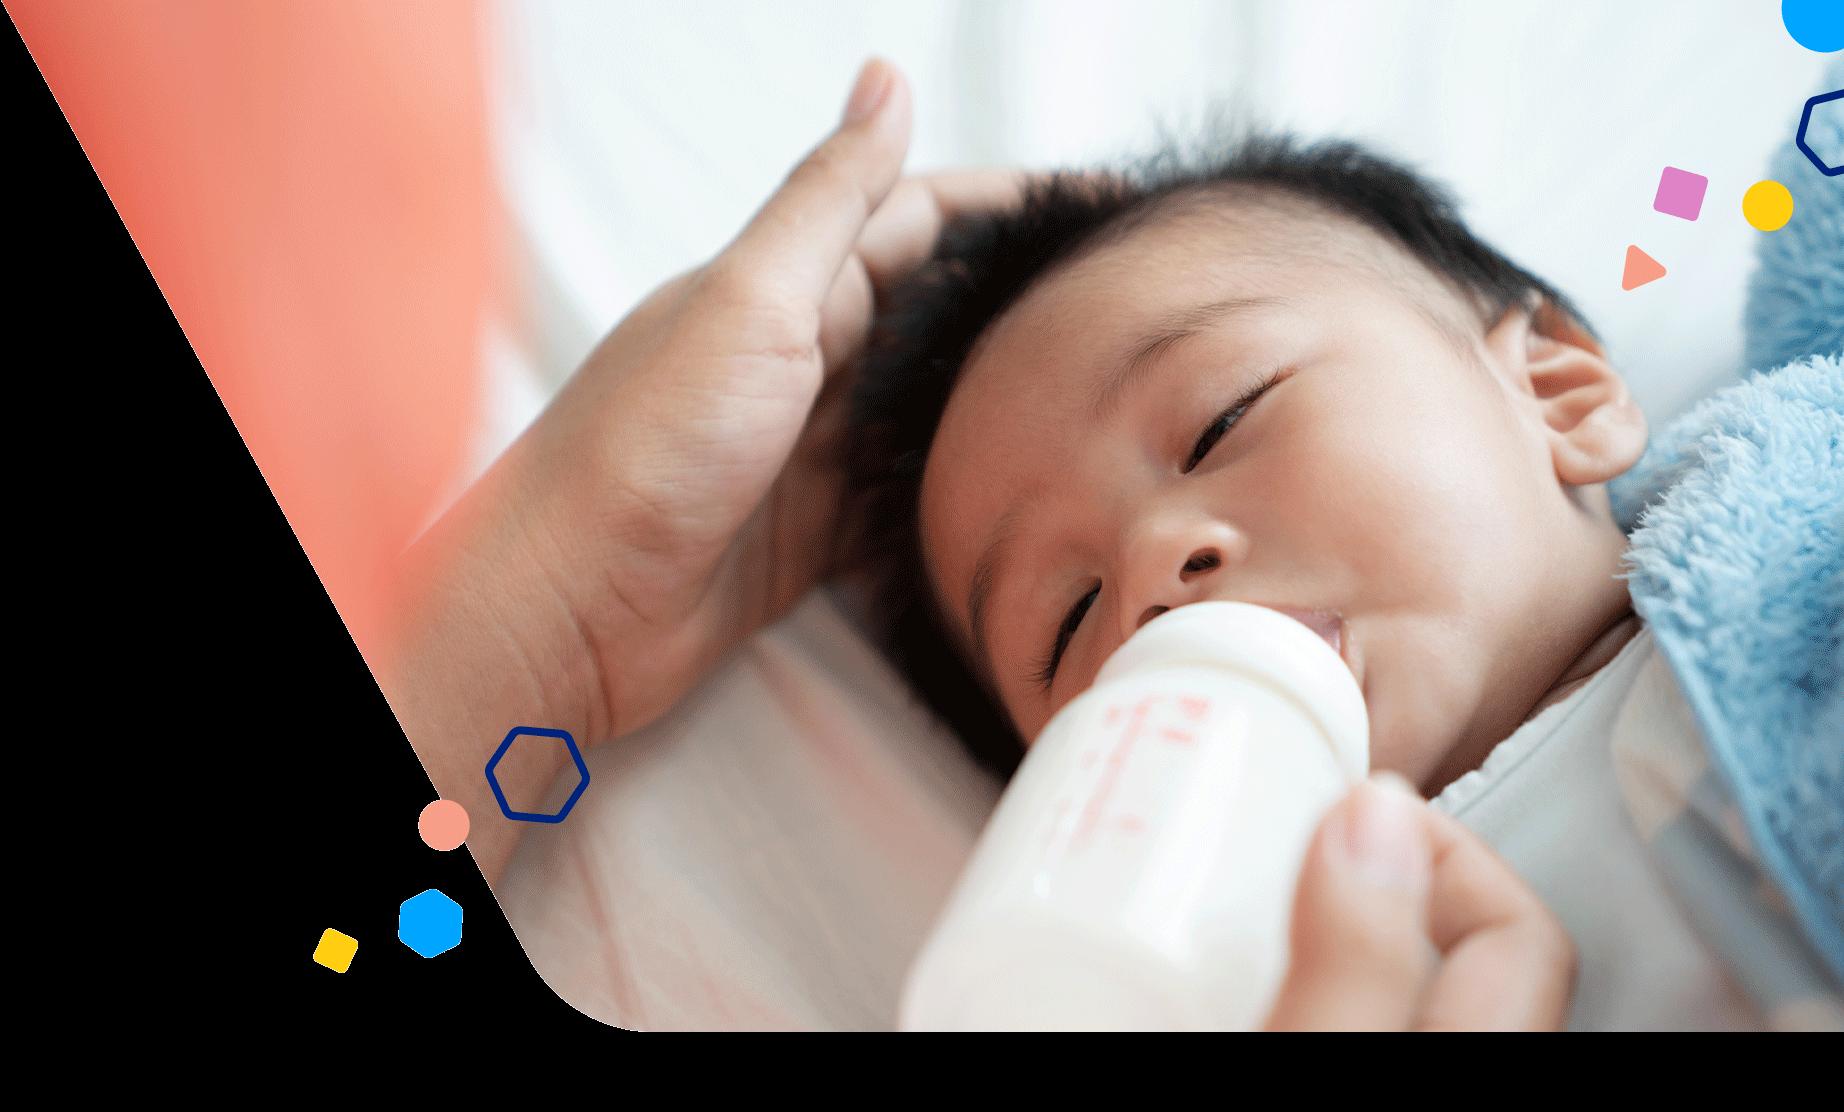 lactose-intolerance-babies-myth